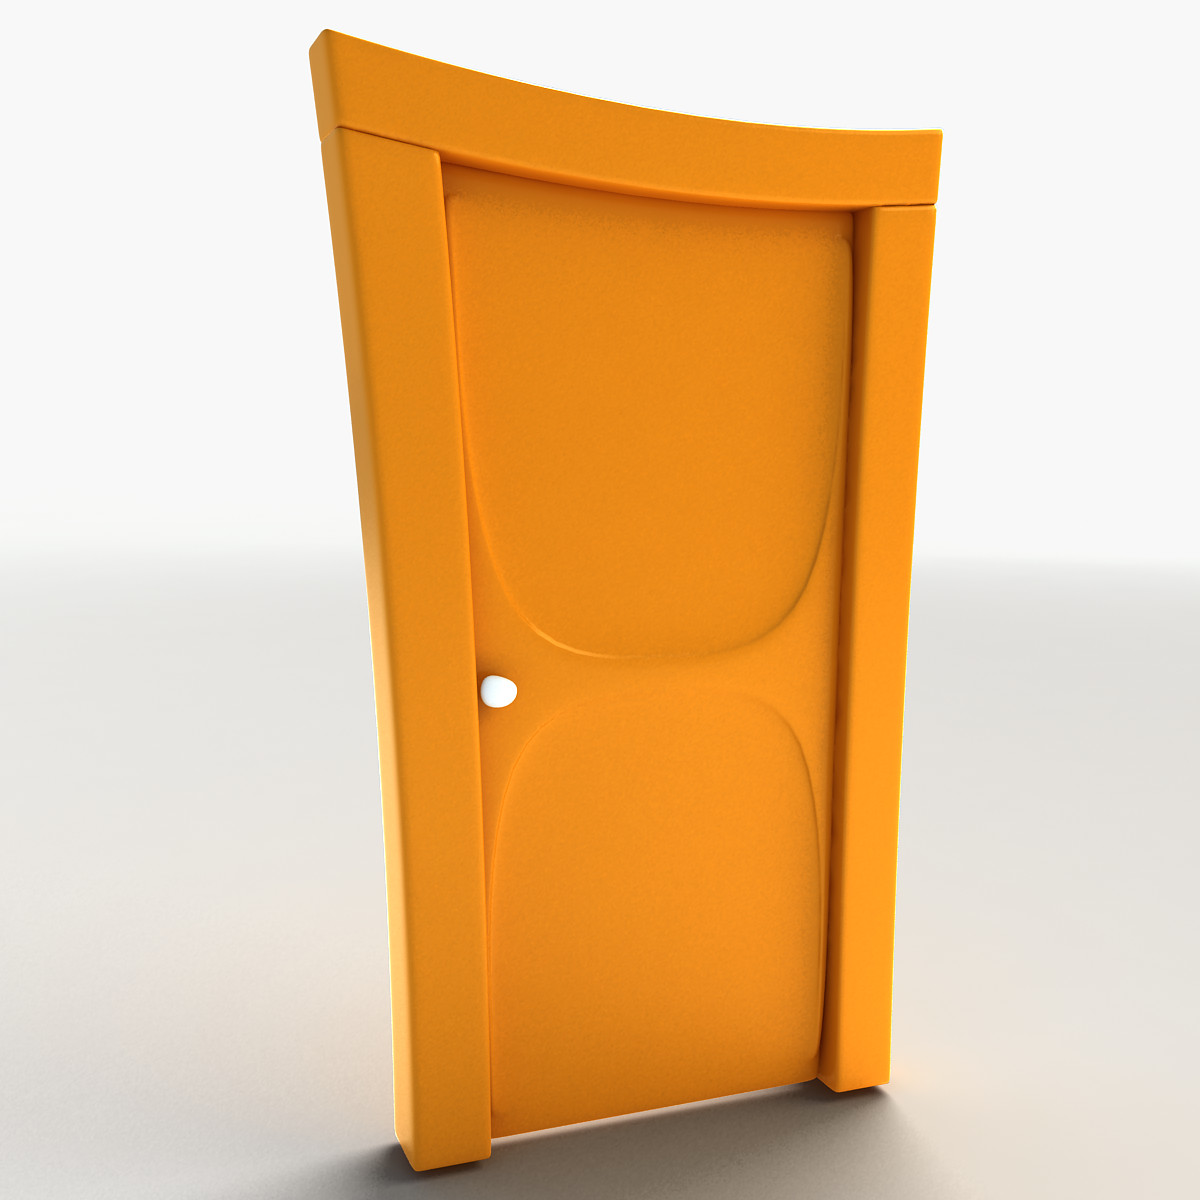 Door Cartoon Png & File:S1E09B Lynn Springs Off Bathroom Door.png